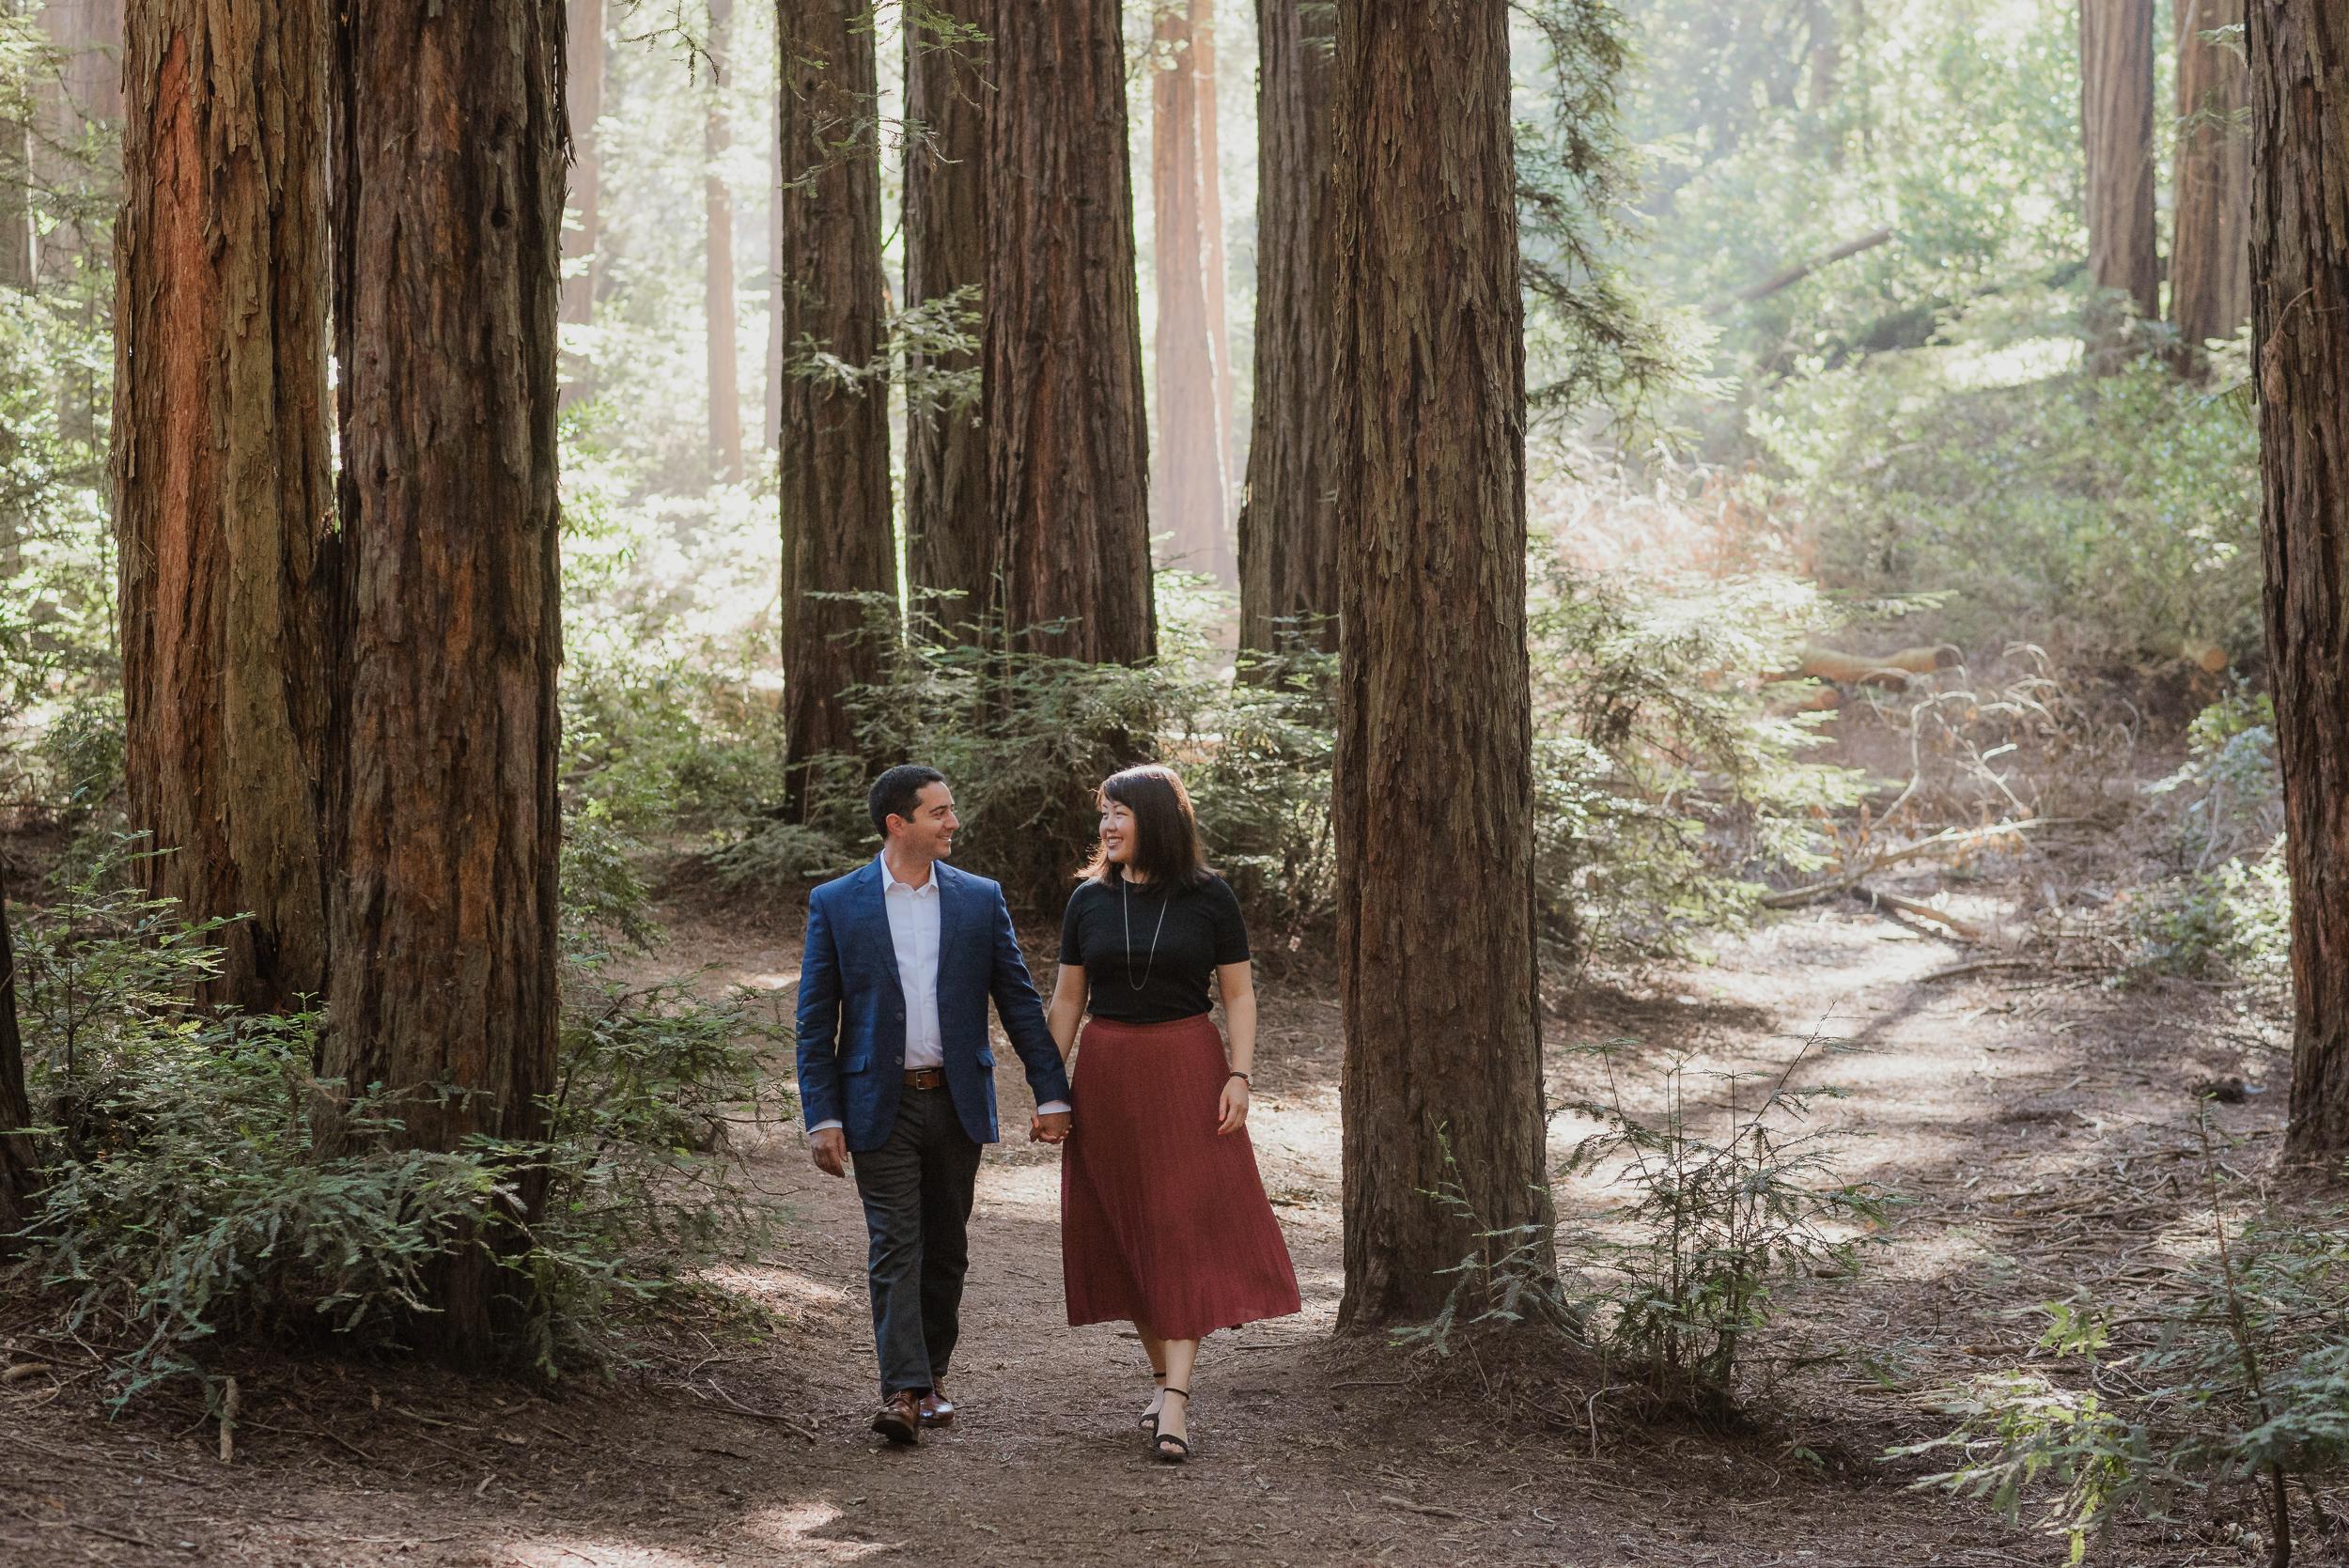 oakland-redwood-engagement-session-photographer-vivianchen-013.jpg